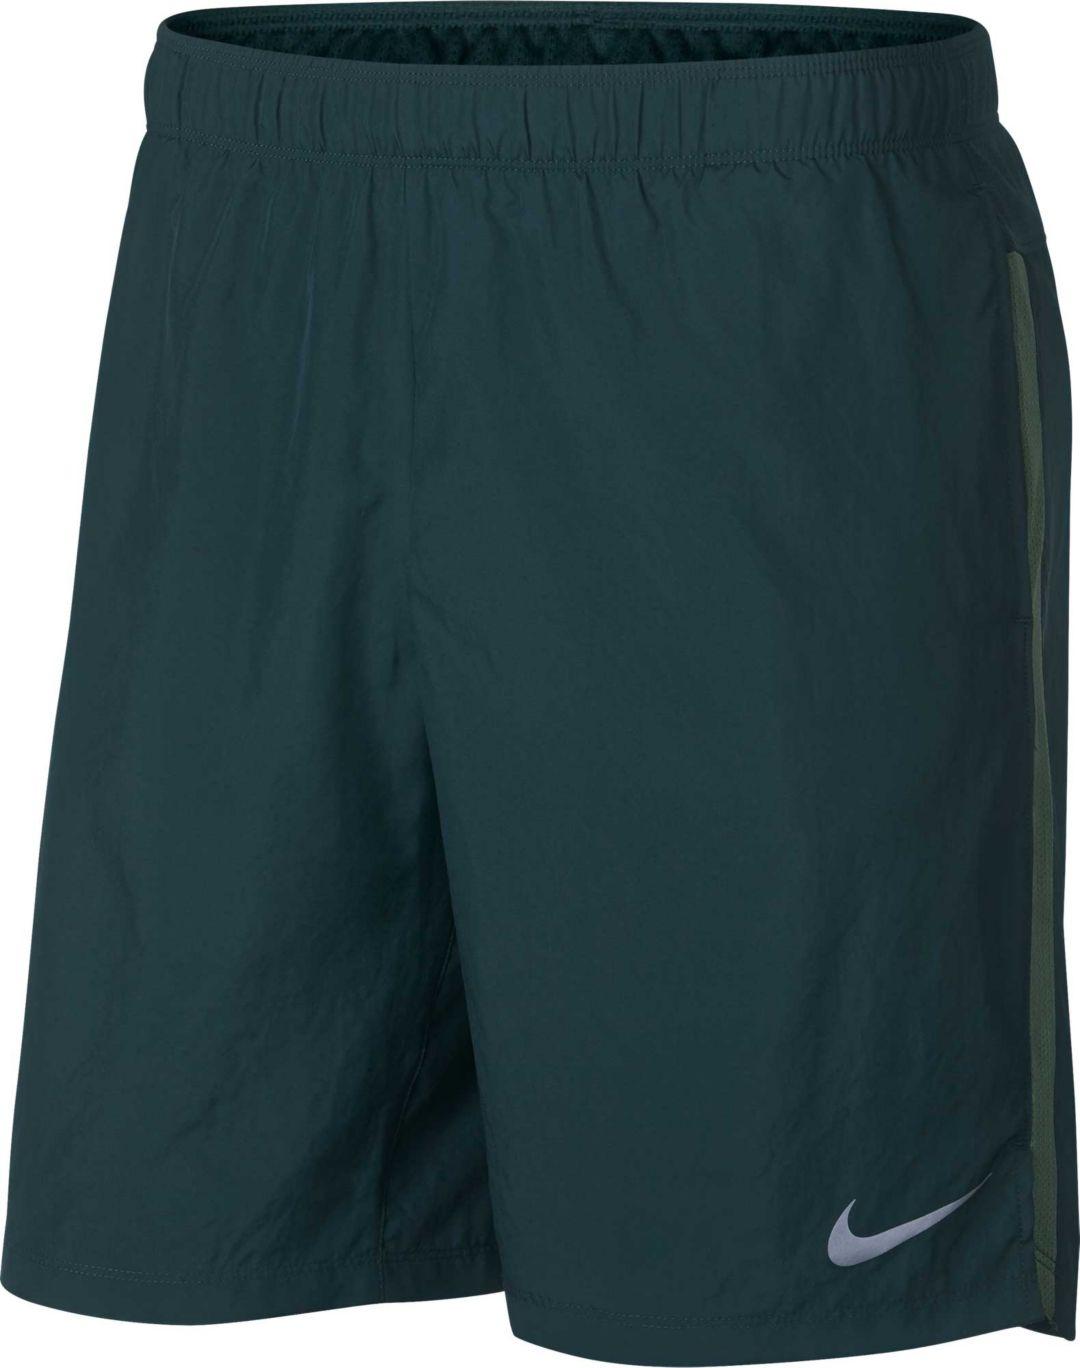 5ad4ddf5f Nike Men's Dry Challenger Running Shorts. noImageFound. Previous